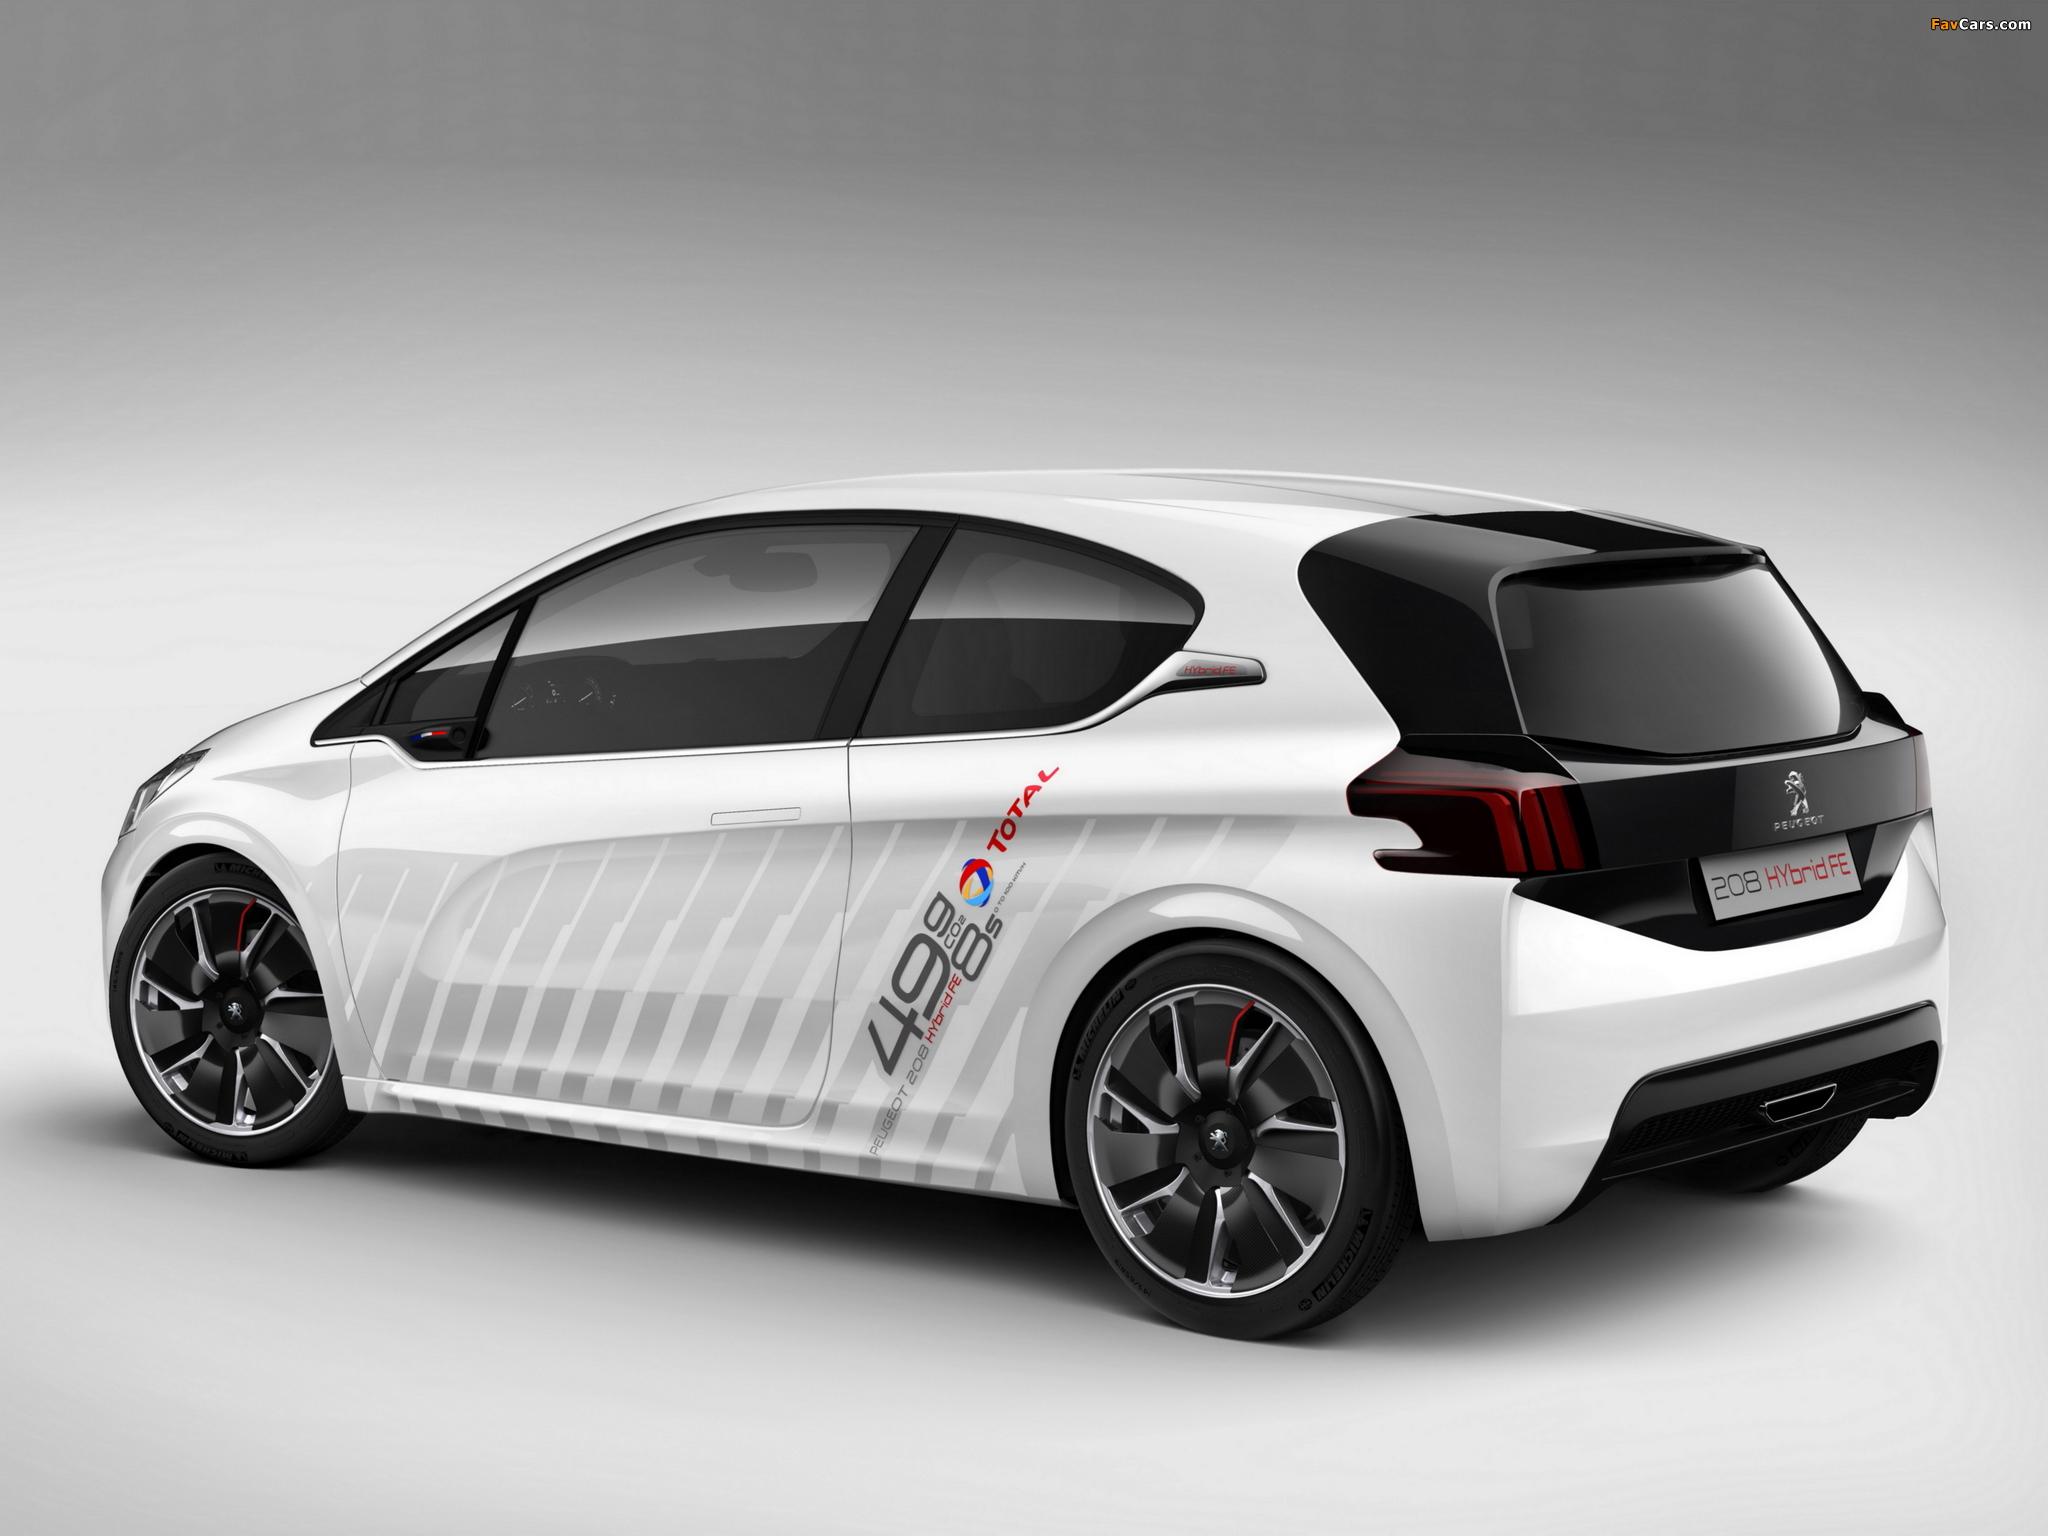 Peugeot 208 HYbrid FE Concept 2013 wallpapers (2048 x 1536)